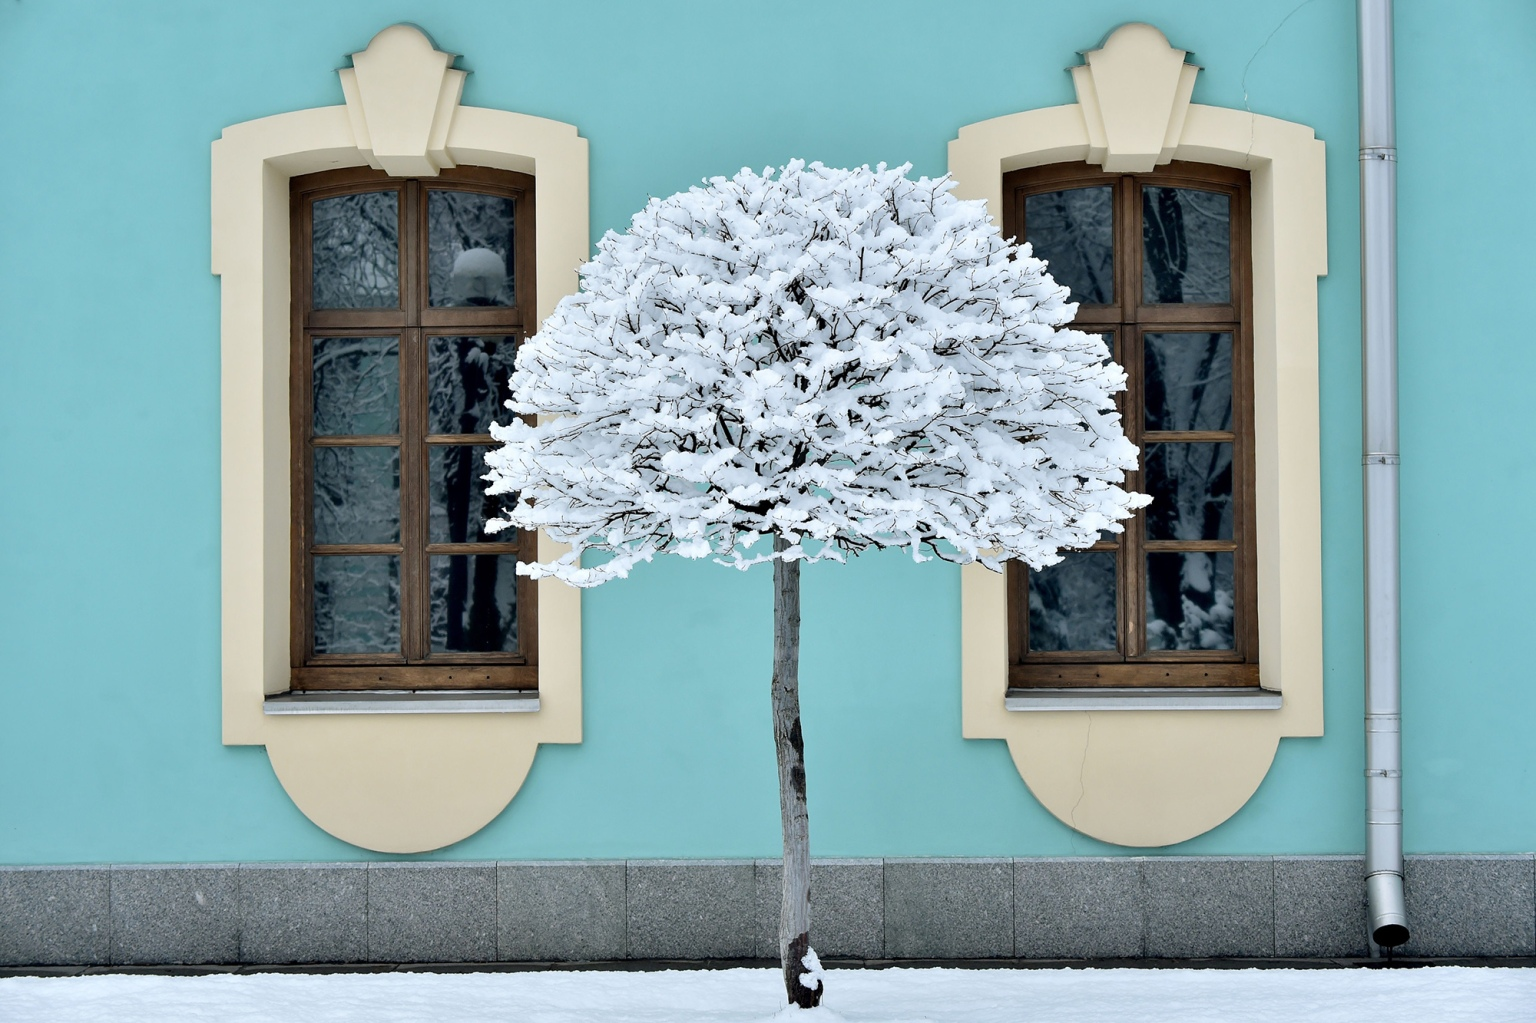 A tree after heavy snowfall in the Ukrainian capital Kiev on Feb. 6. (Sergei Supinsky/AFP/Getty Images)